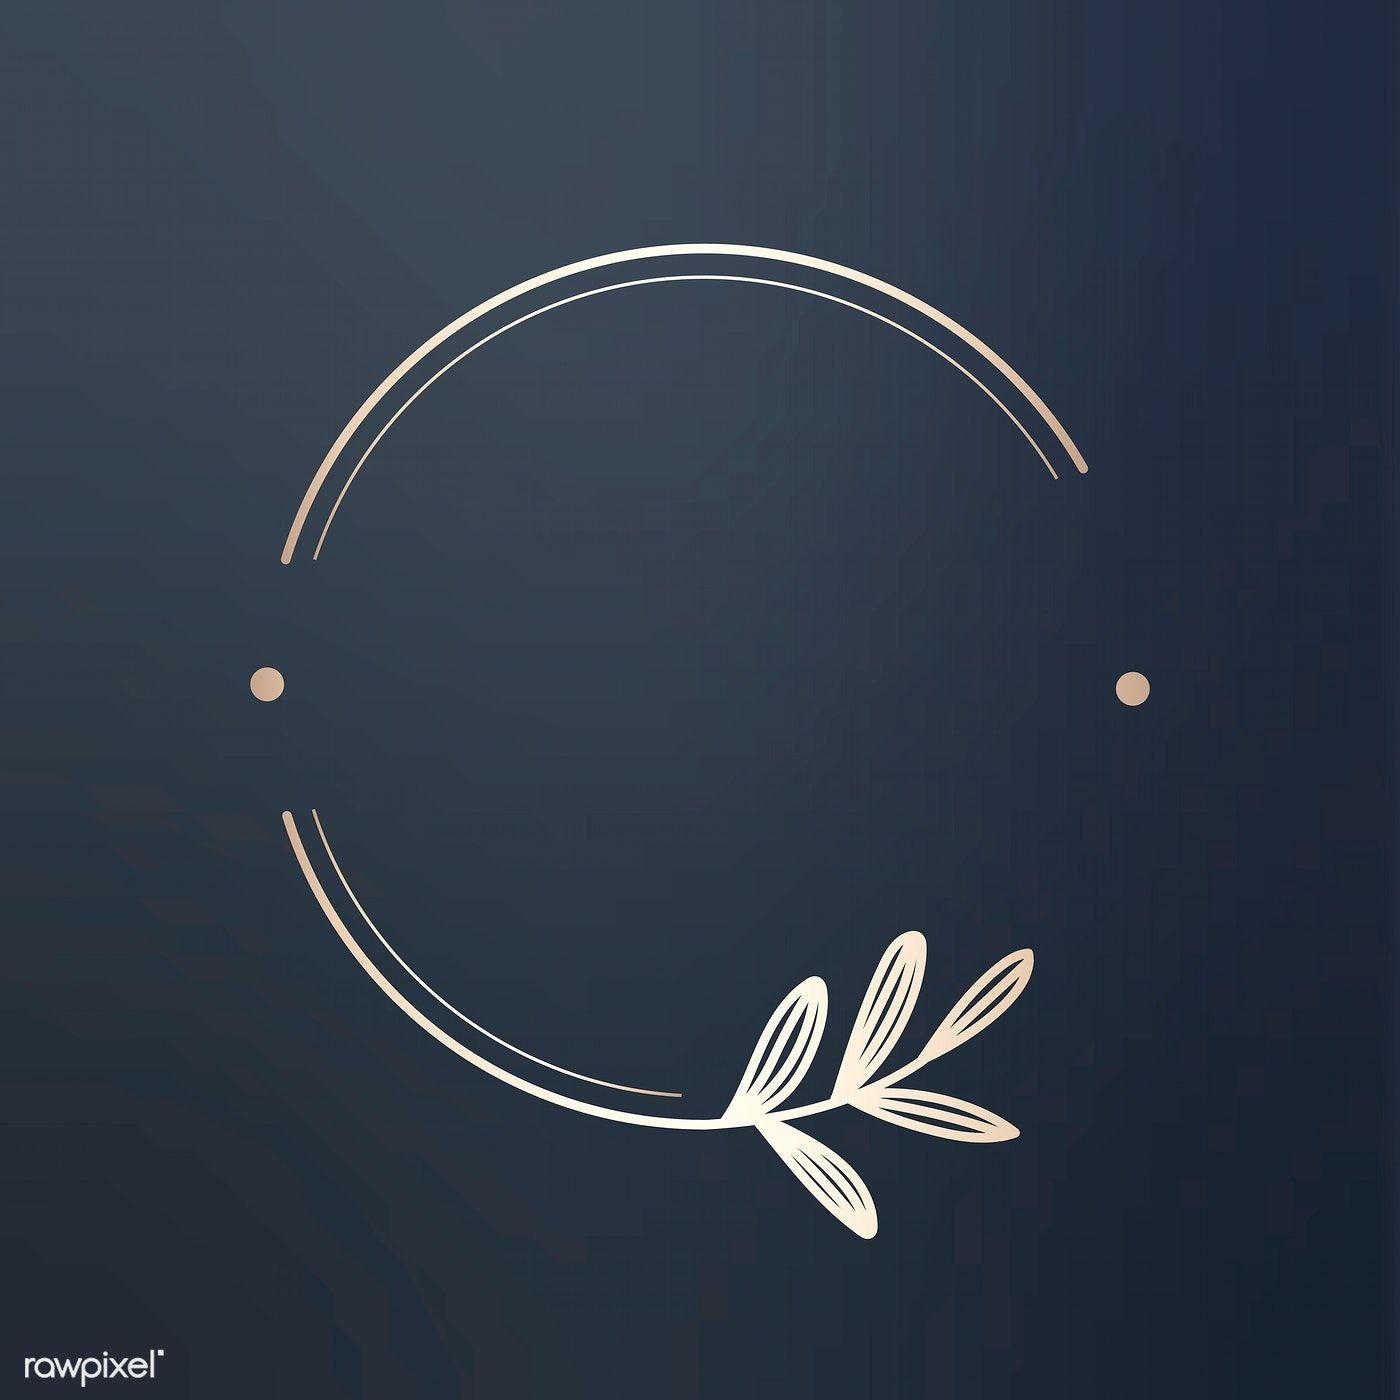 Download premium illustration of Round floral design logo vector 679788